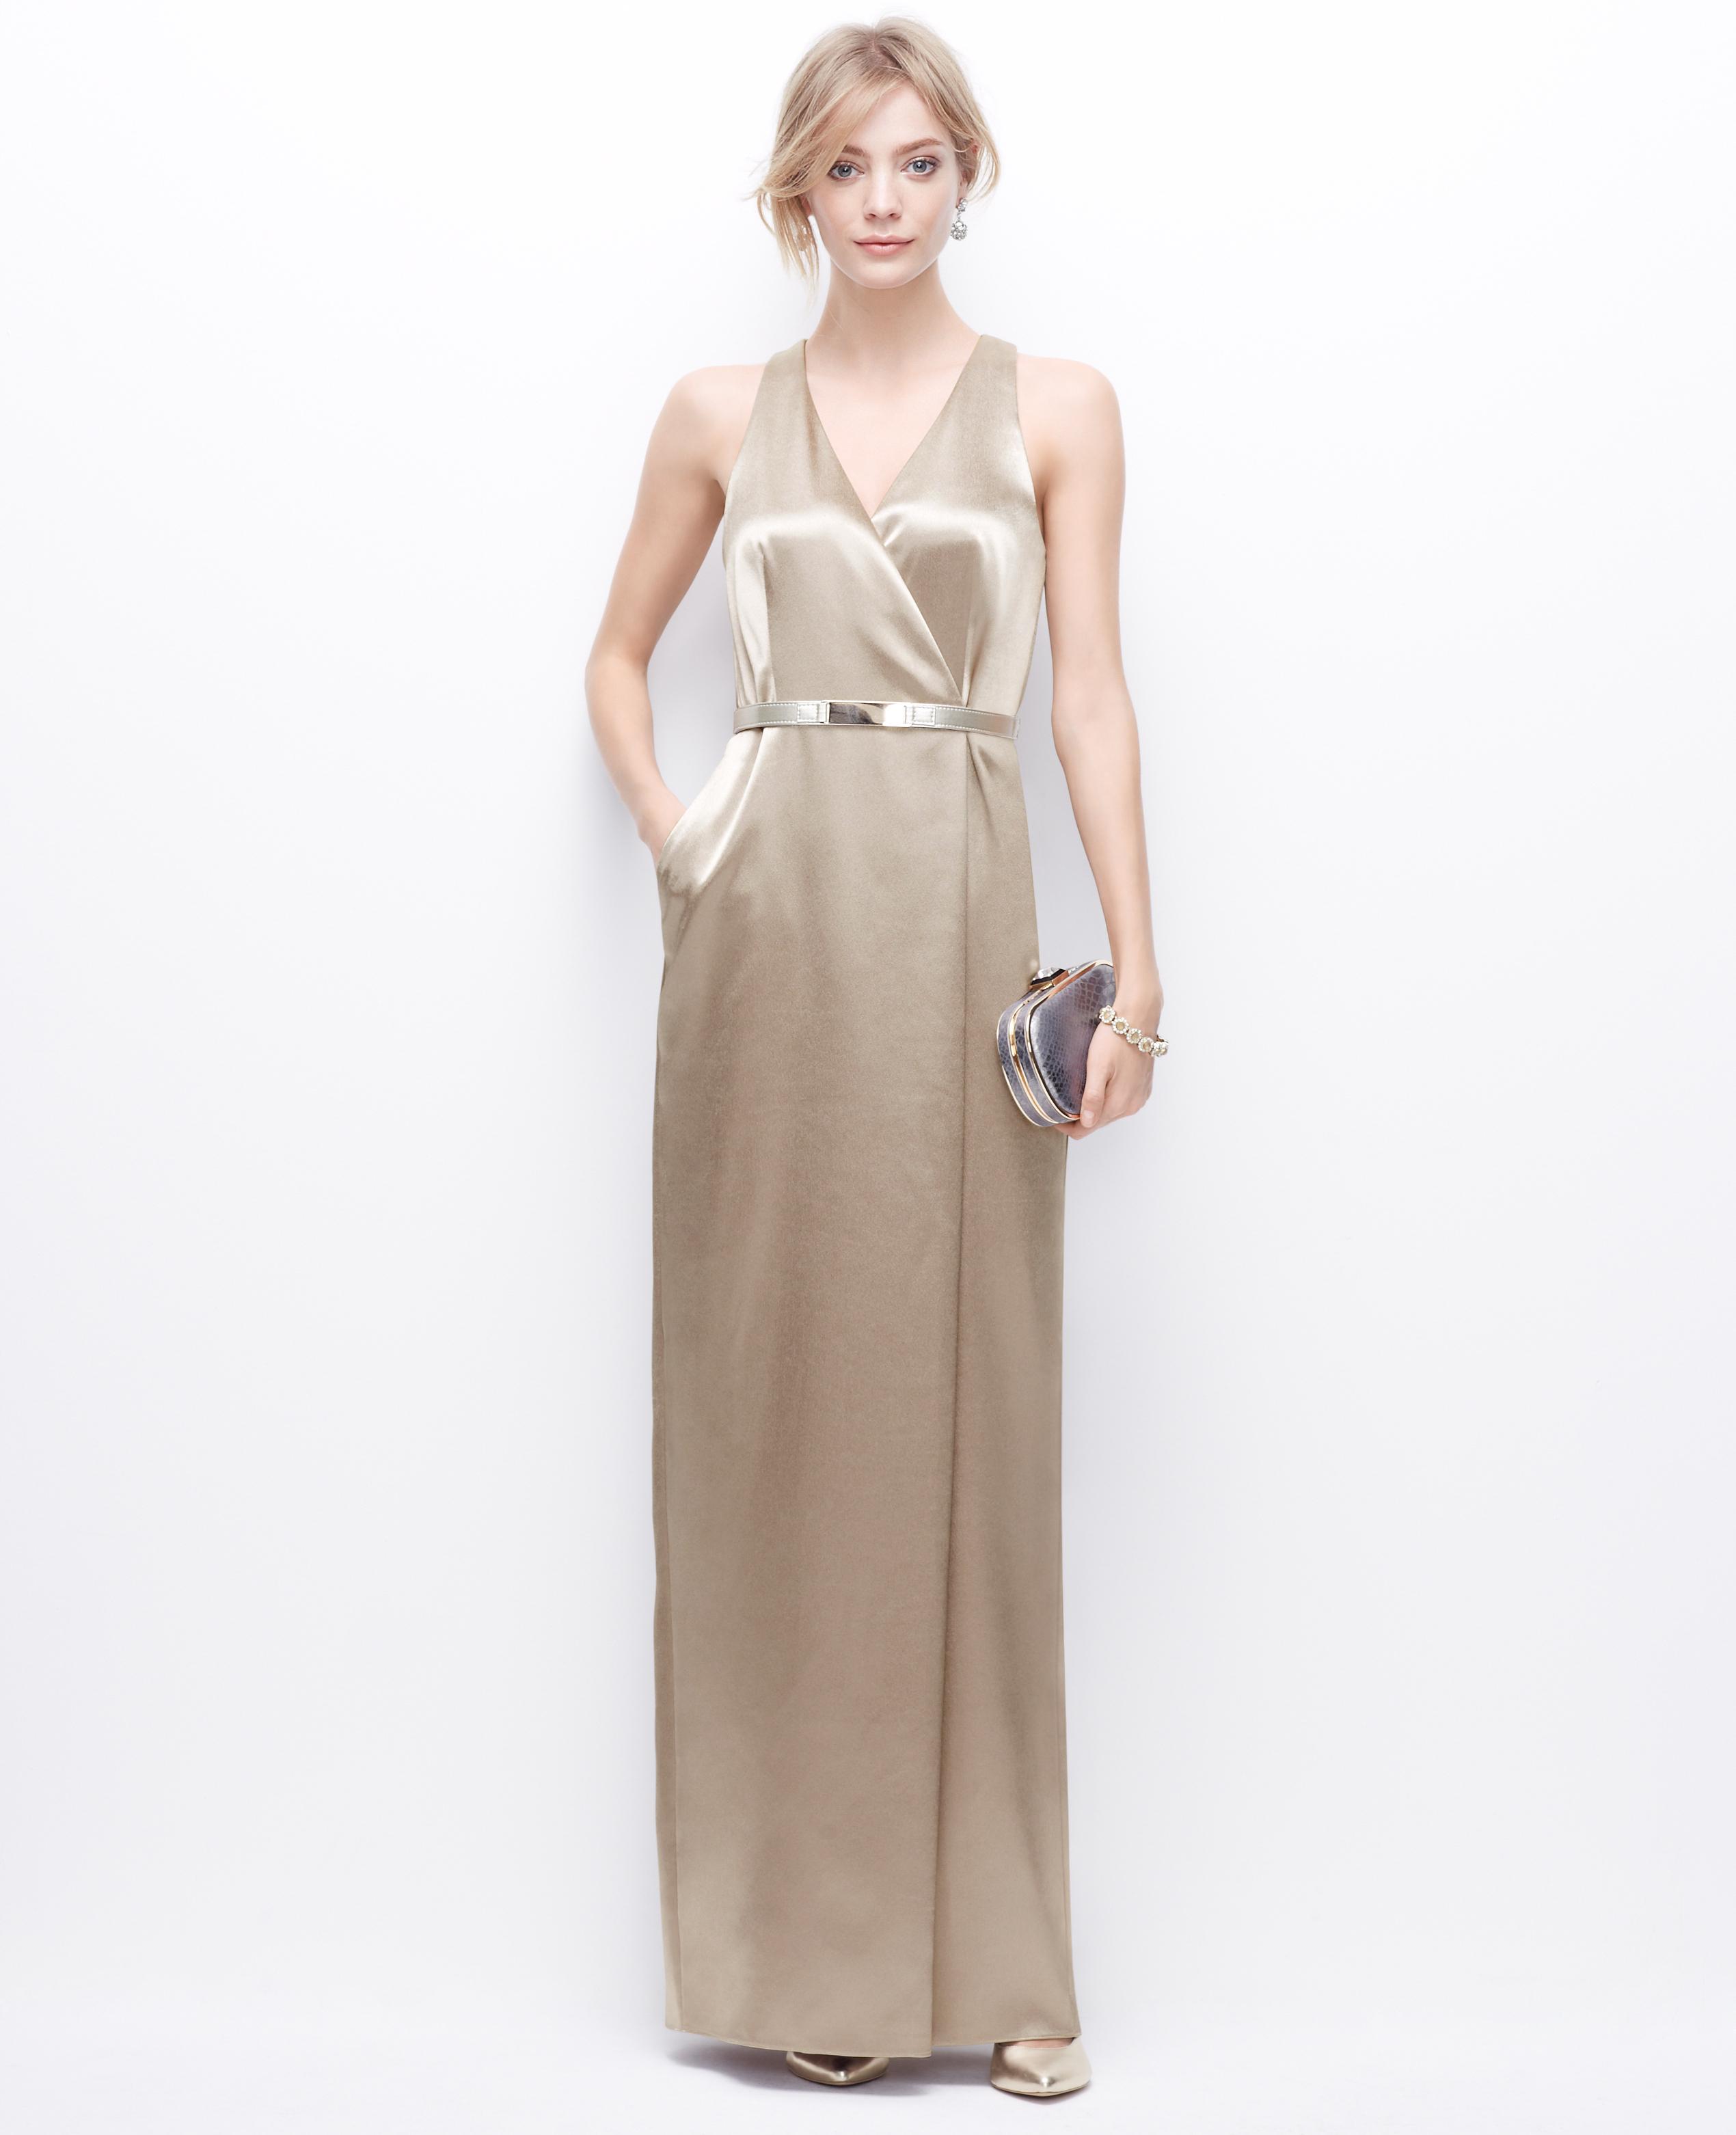 Lyst - Ann Taylor Petite Satin V-Neck Gown in Metallic